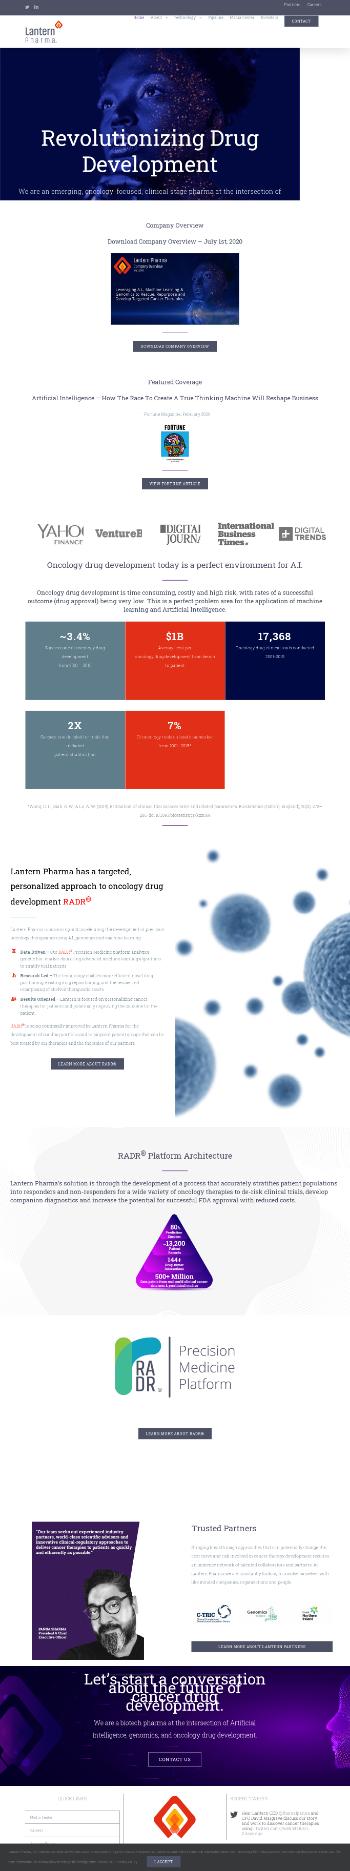 Lantern Pharma Inc. Website Screenshot